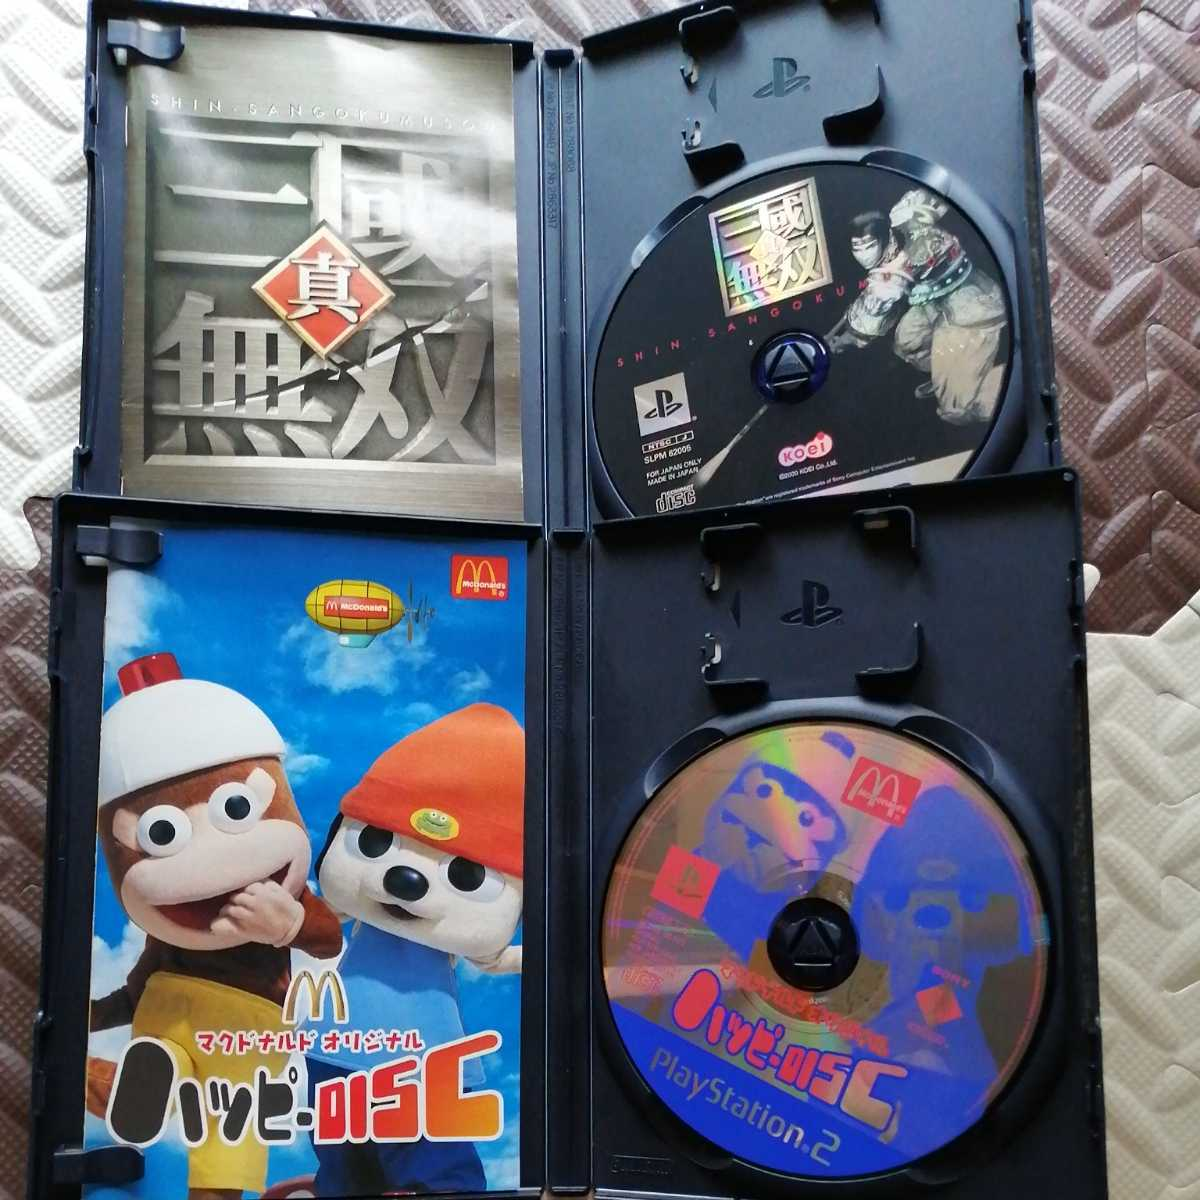 PS2ソフト 2本セット マクドナルド 真三国無双 動作確認済み